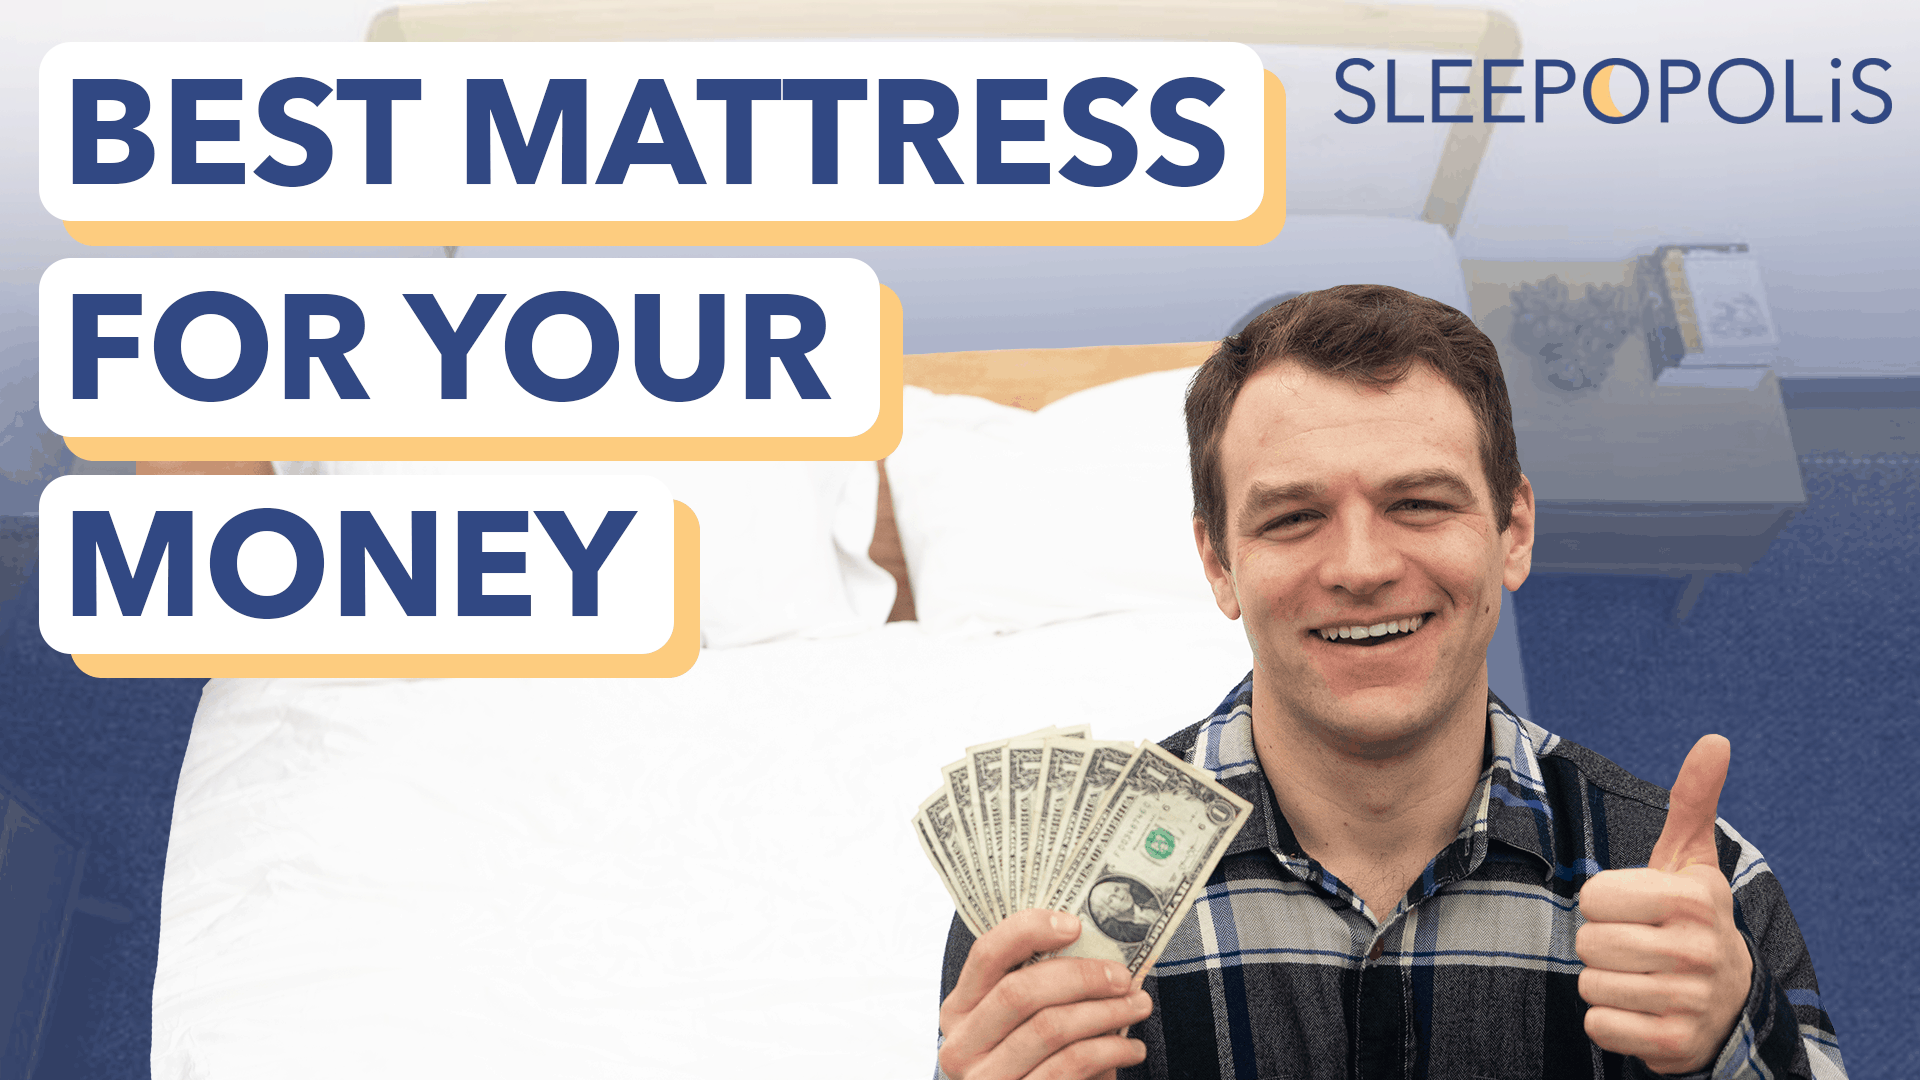 Best Mattress For The Money 2019 Sleepopolis